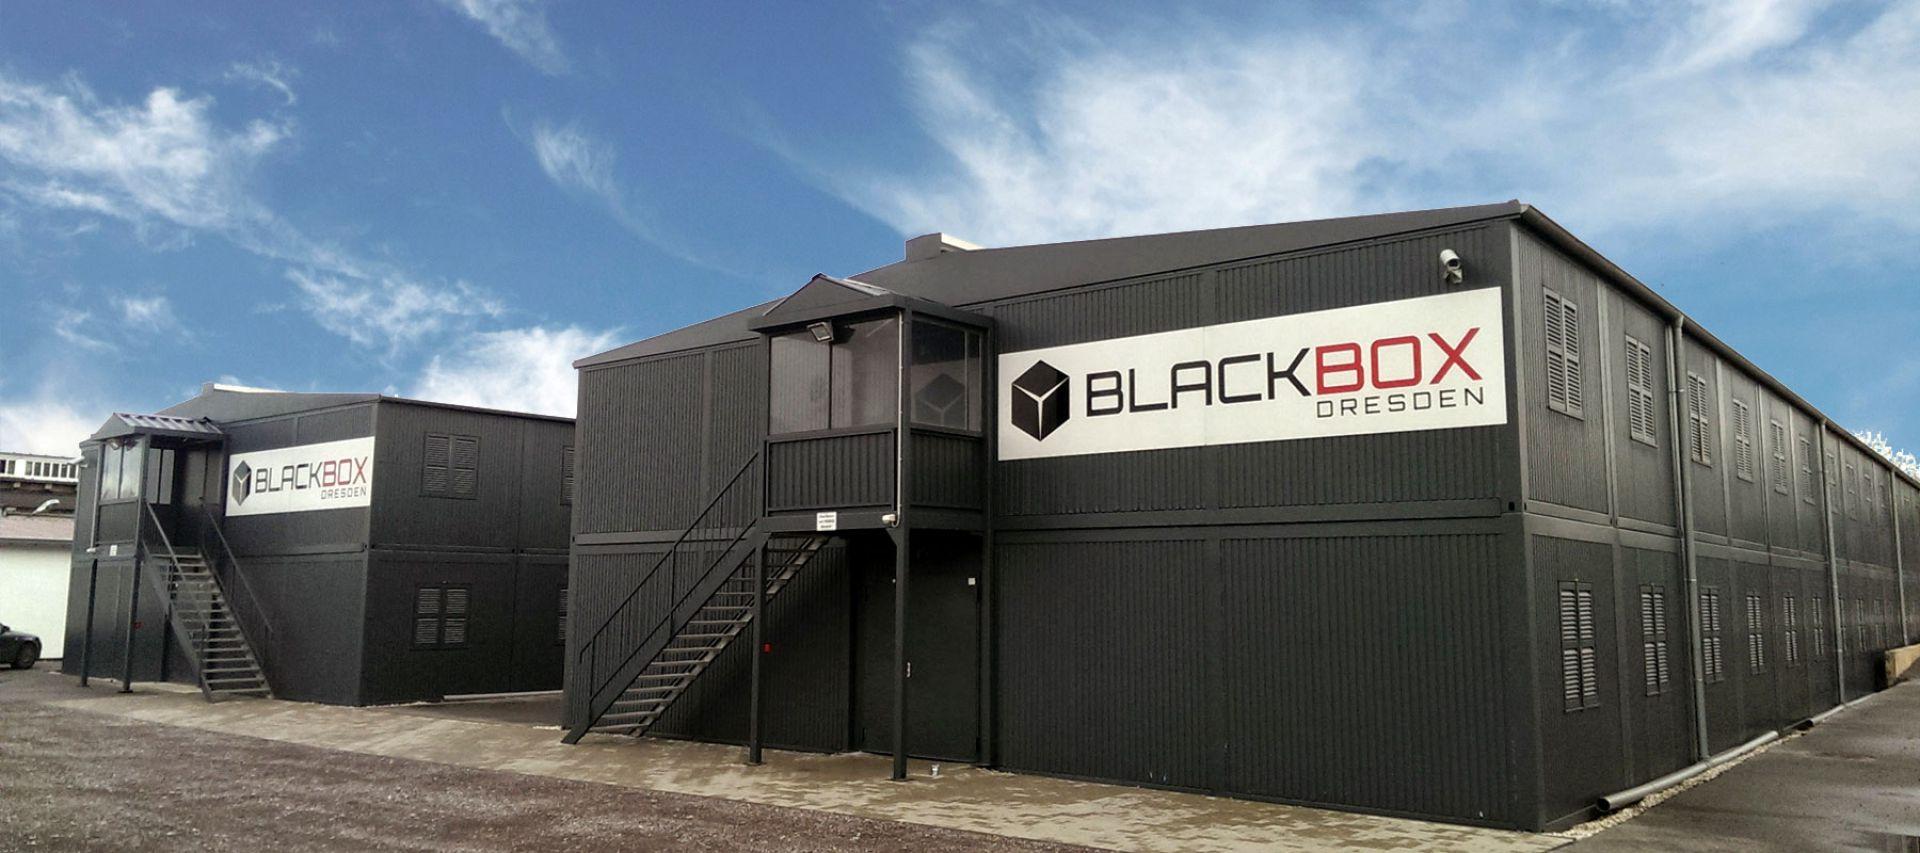 lagerbox lageraum mieten in dresden blackbox lagerbox dresden. Black Bedroom Furniture Sets. Home Design Ideas